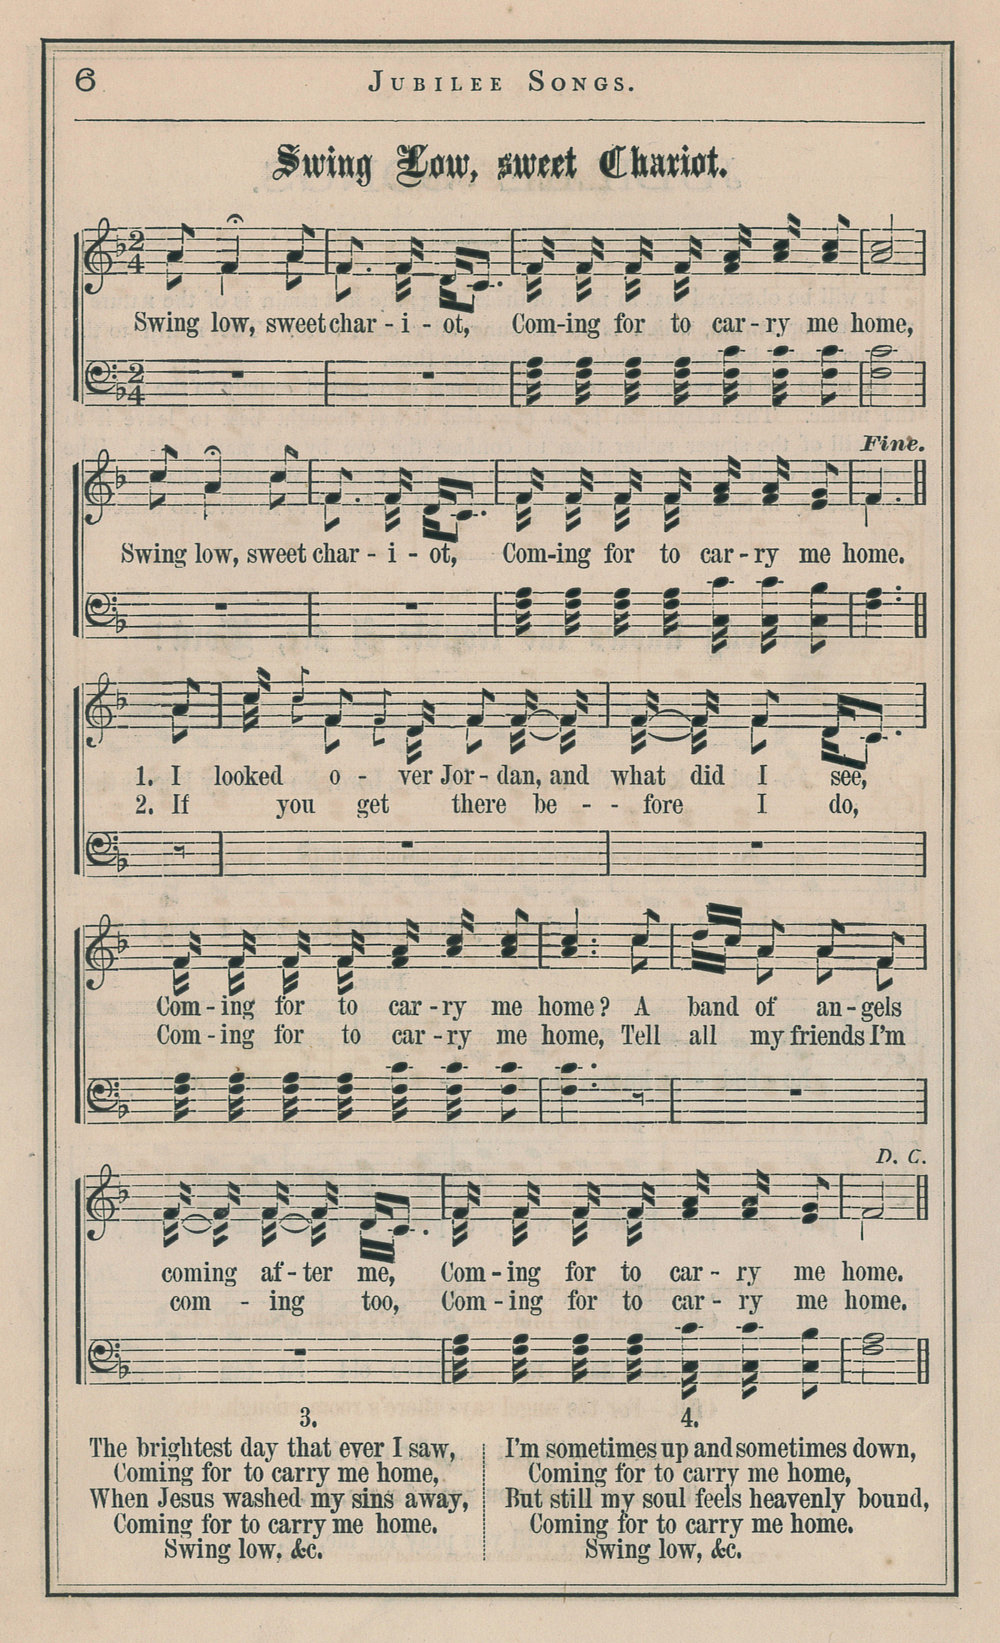 Fig. 1.   Jubilee Songs as Sung by the Jubilee Singers of Fisk University  (NY: Biglow & Main, 1872).